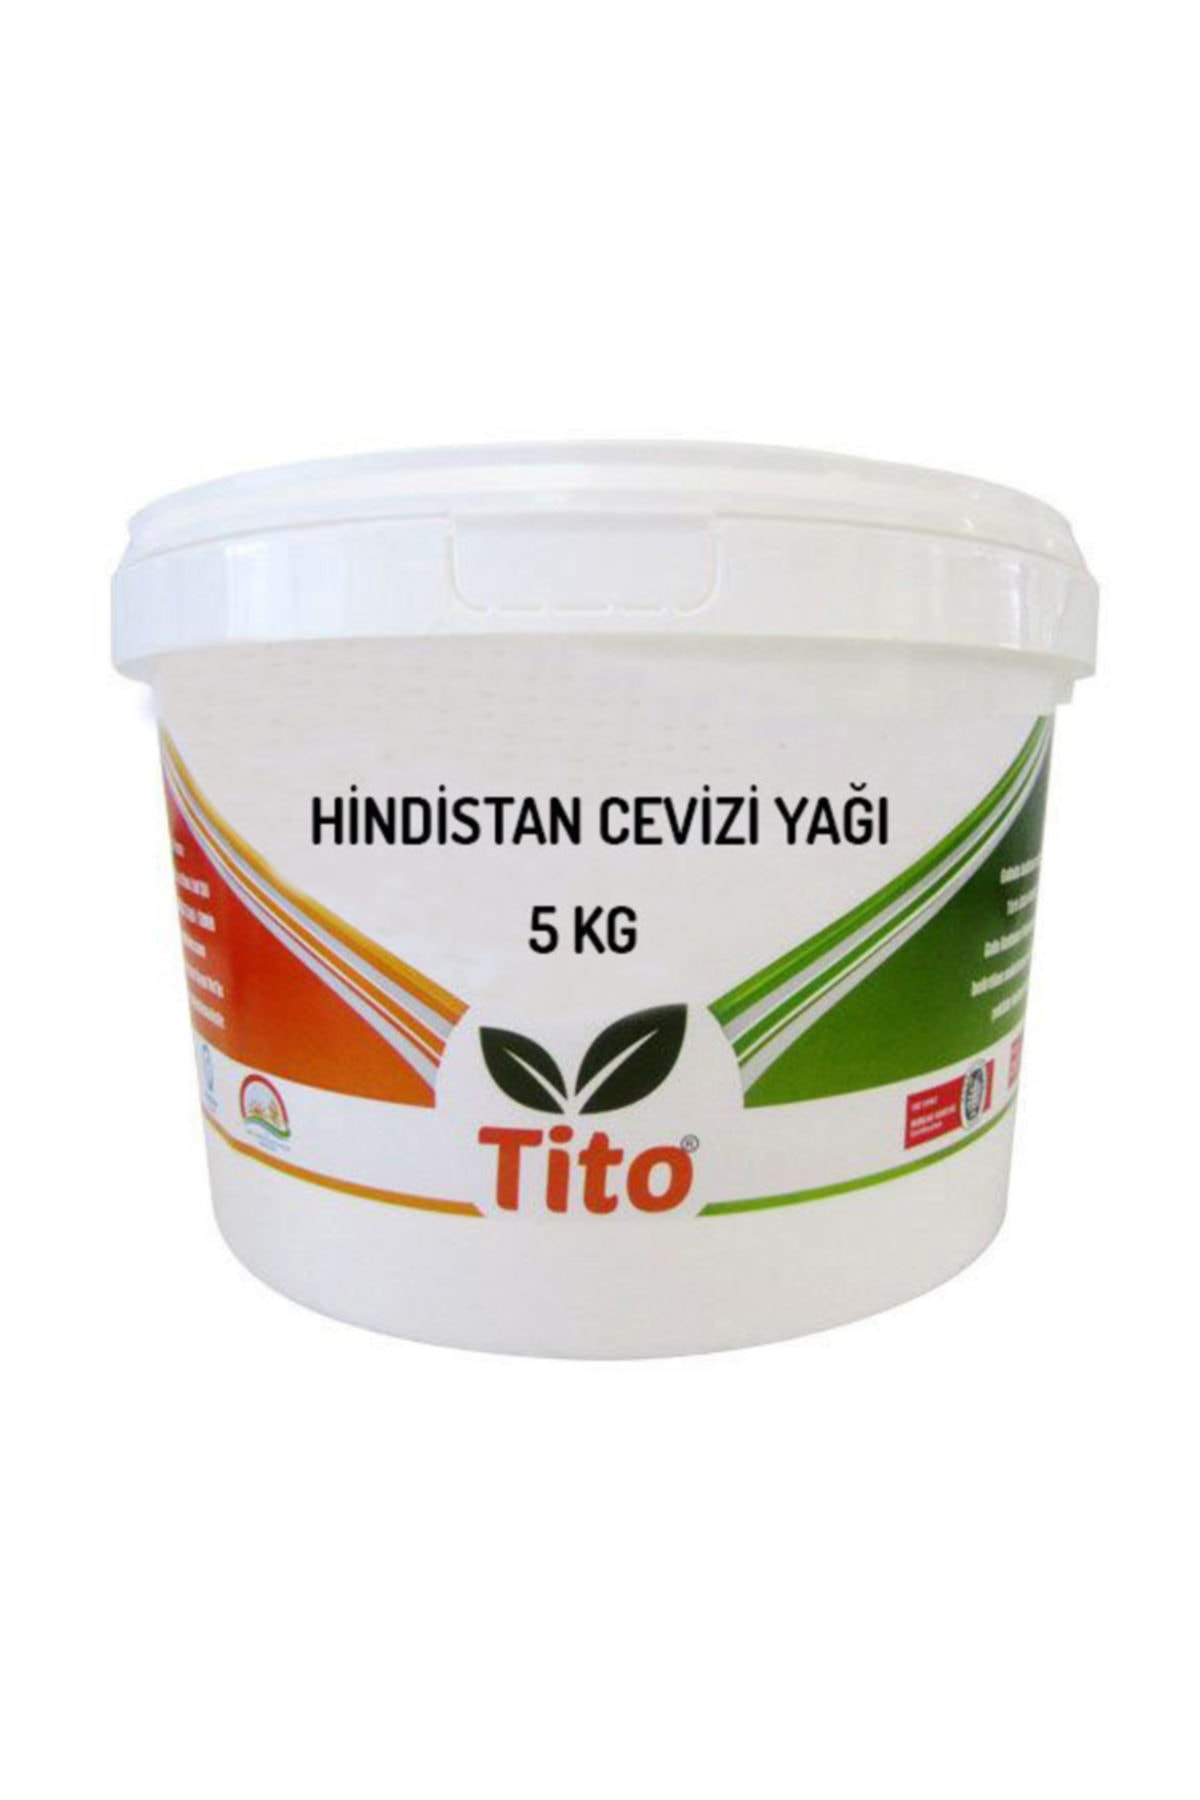 tito Deoderize Hindistan Cevizi Yağı 5 Kg 1